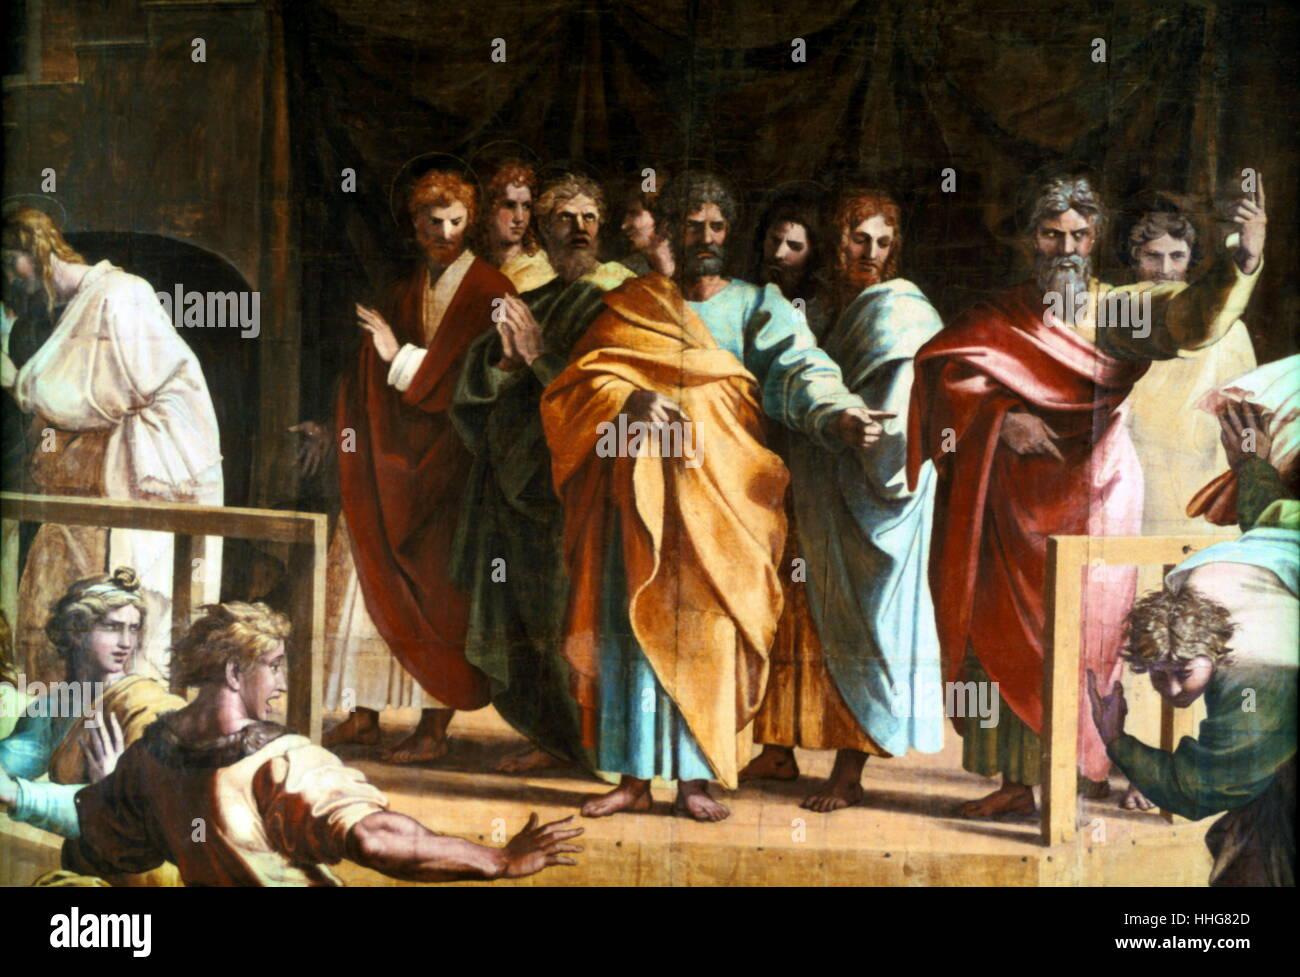 Painting By The Italian High Renaissance Artist Raphael Raffaello Sanzio Da Urbino